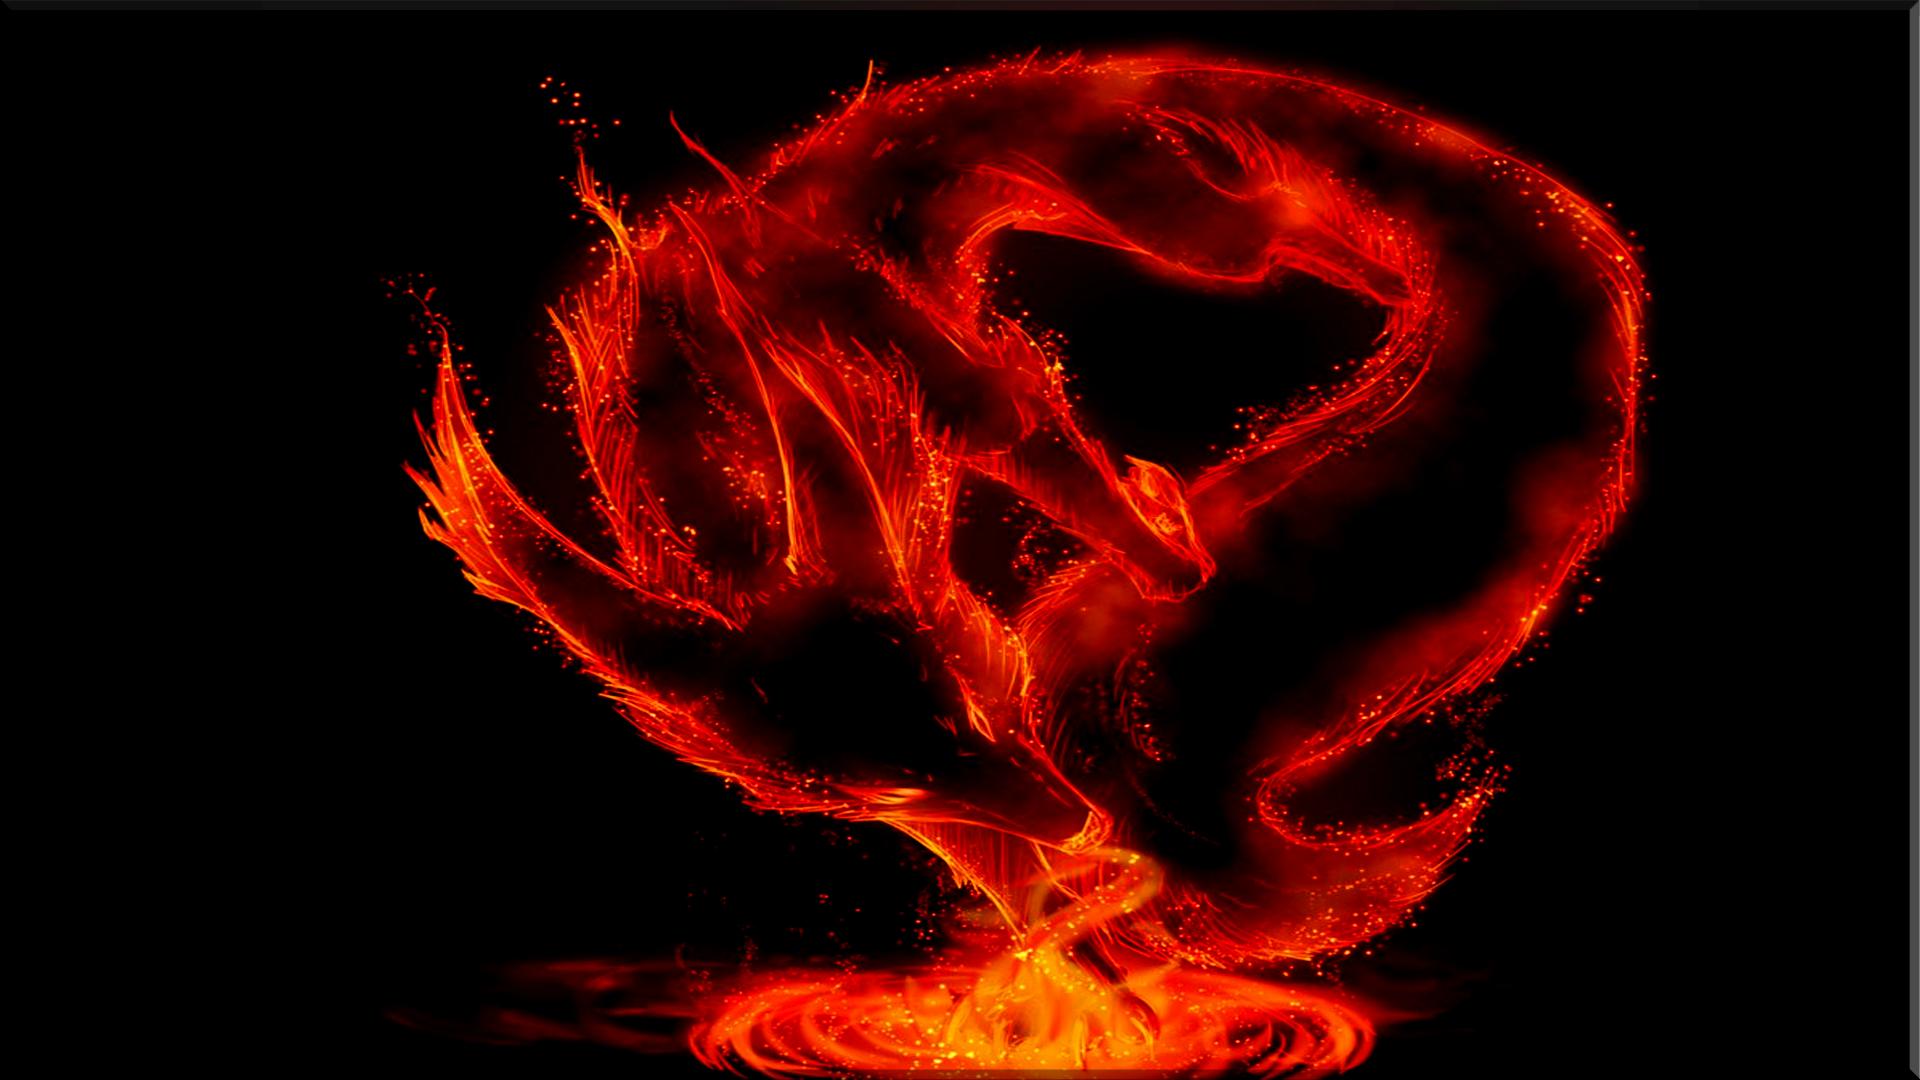 Fire Dragons Computer Wallpapers Desktop Backgrounds 1920x1080 ID 1920x1080